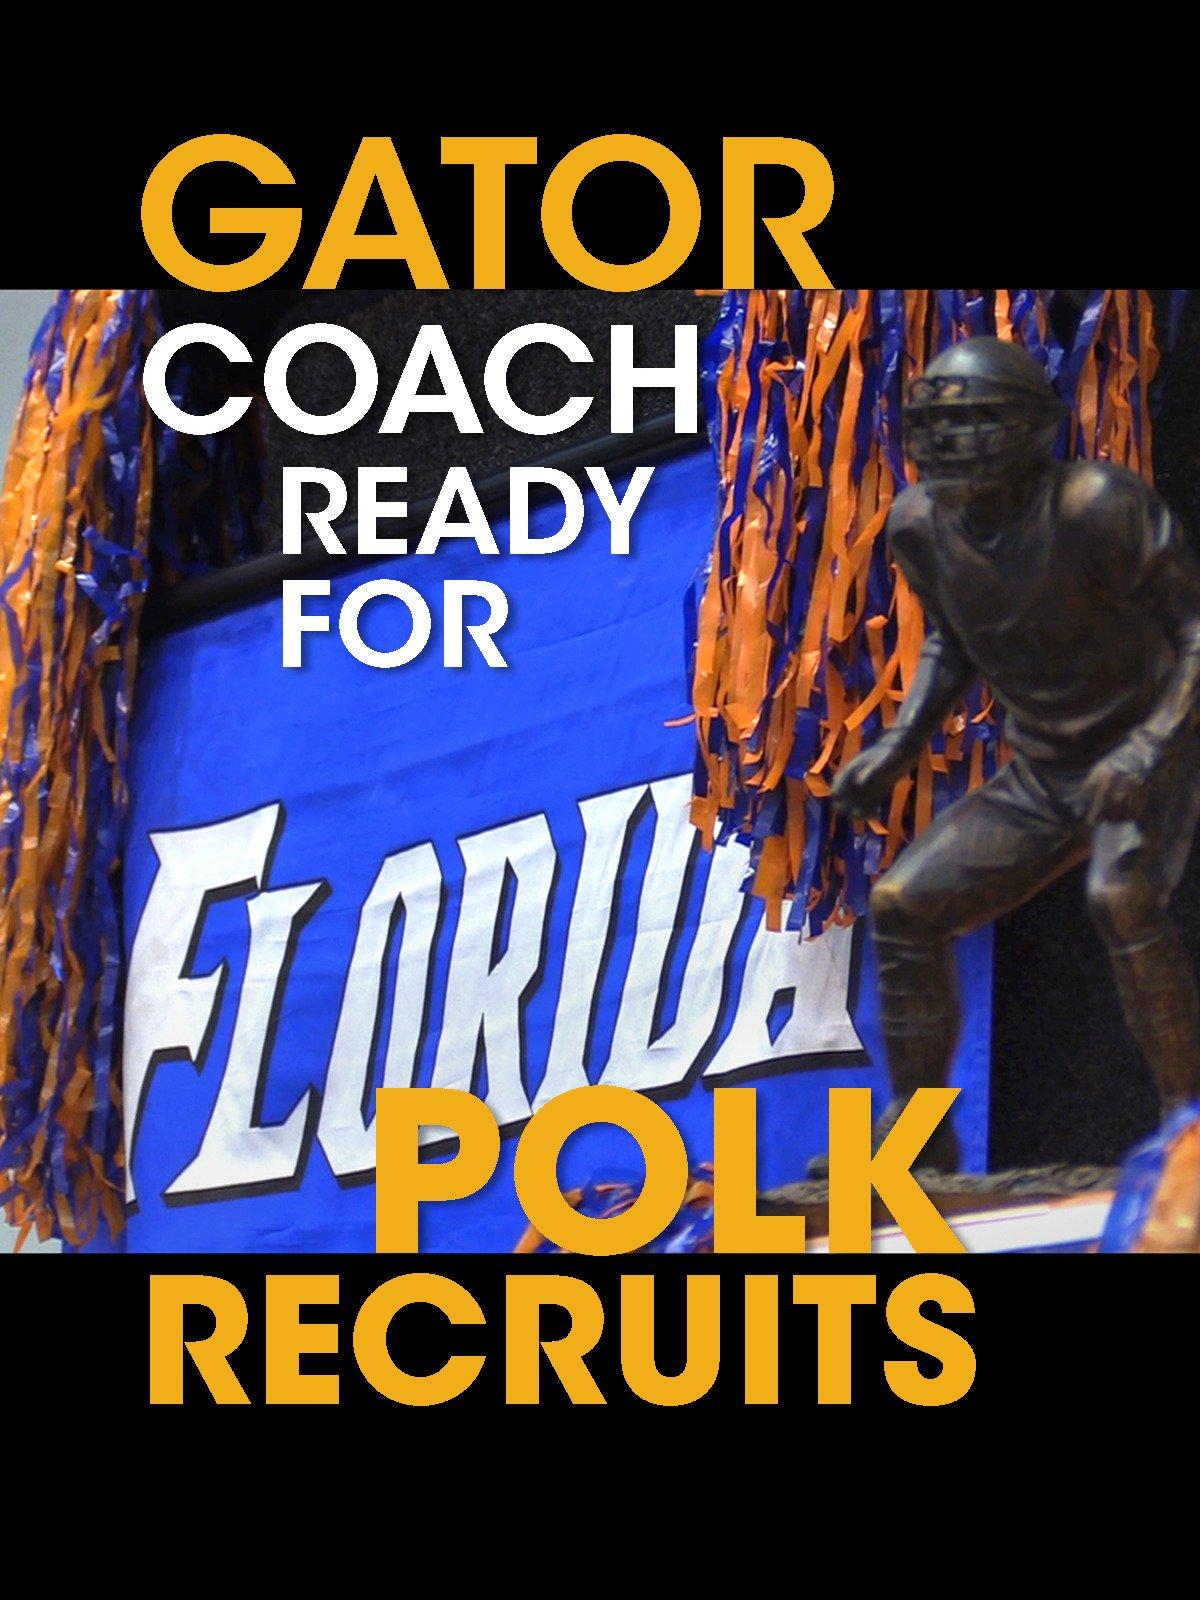 Gator Coach Ready for Polk Recruits